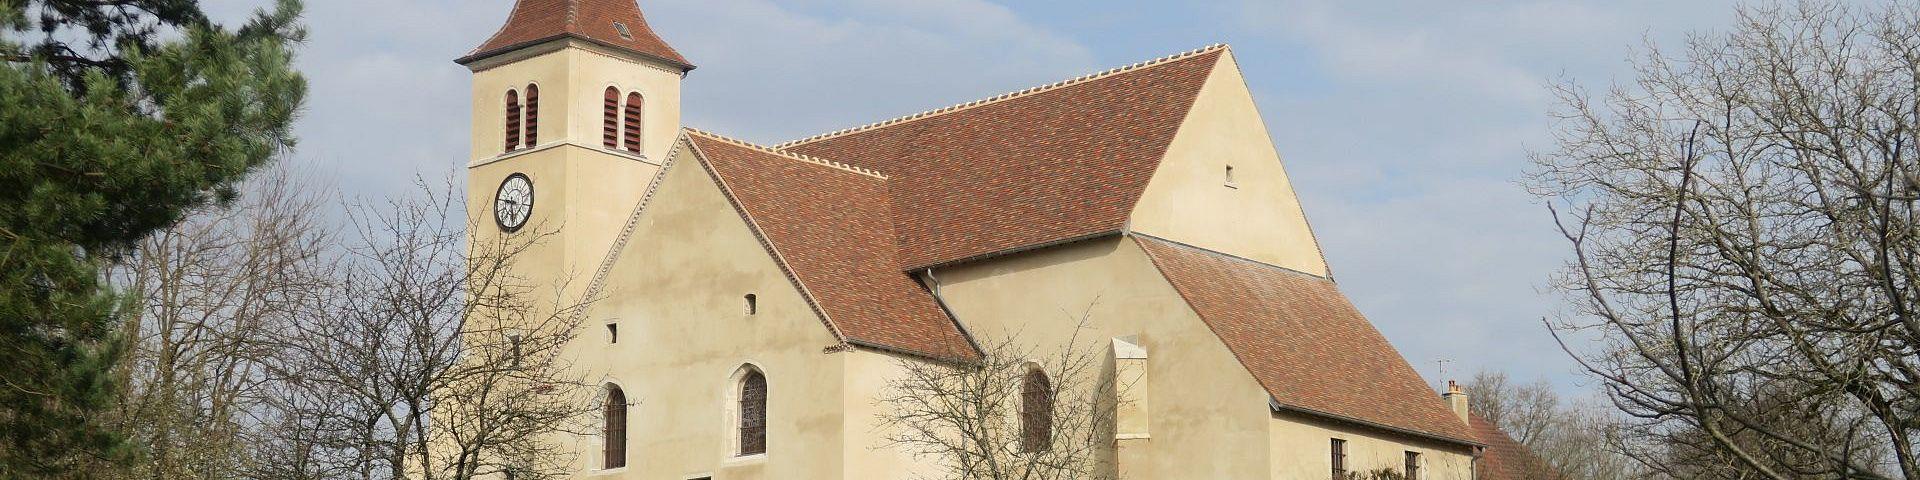 Santans - Eglise (39)